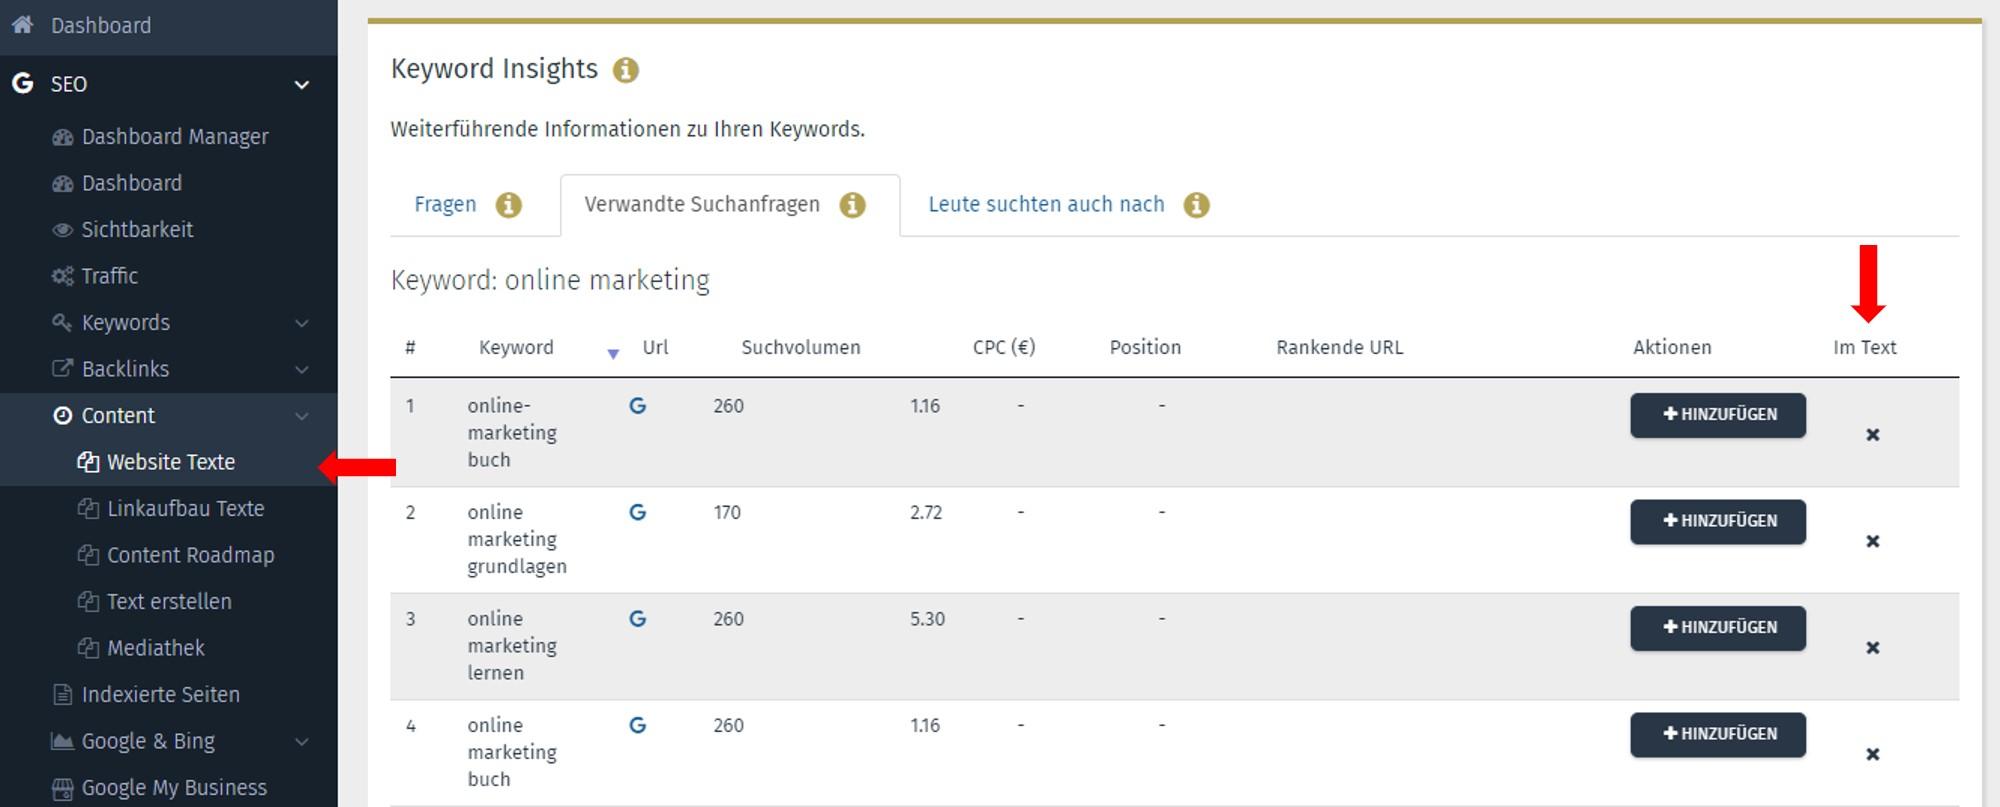 SEO Content Tool Performance Suite Keyword Insights Verwandte Suchanfragen